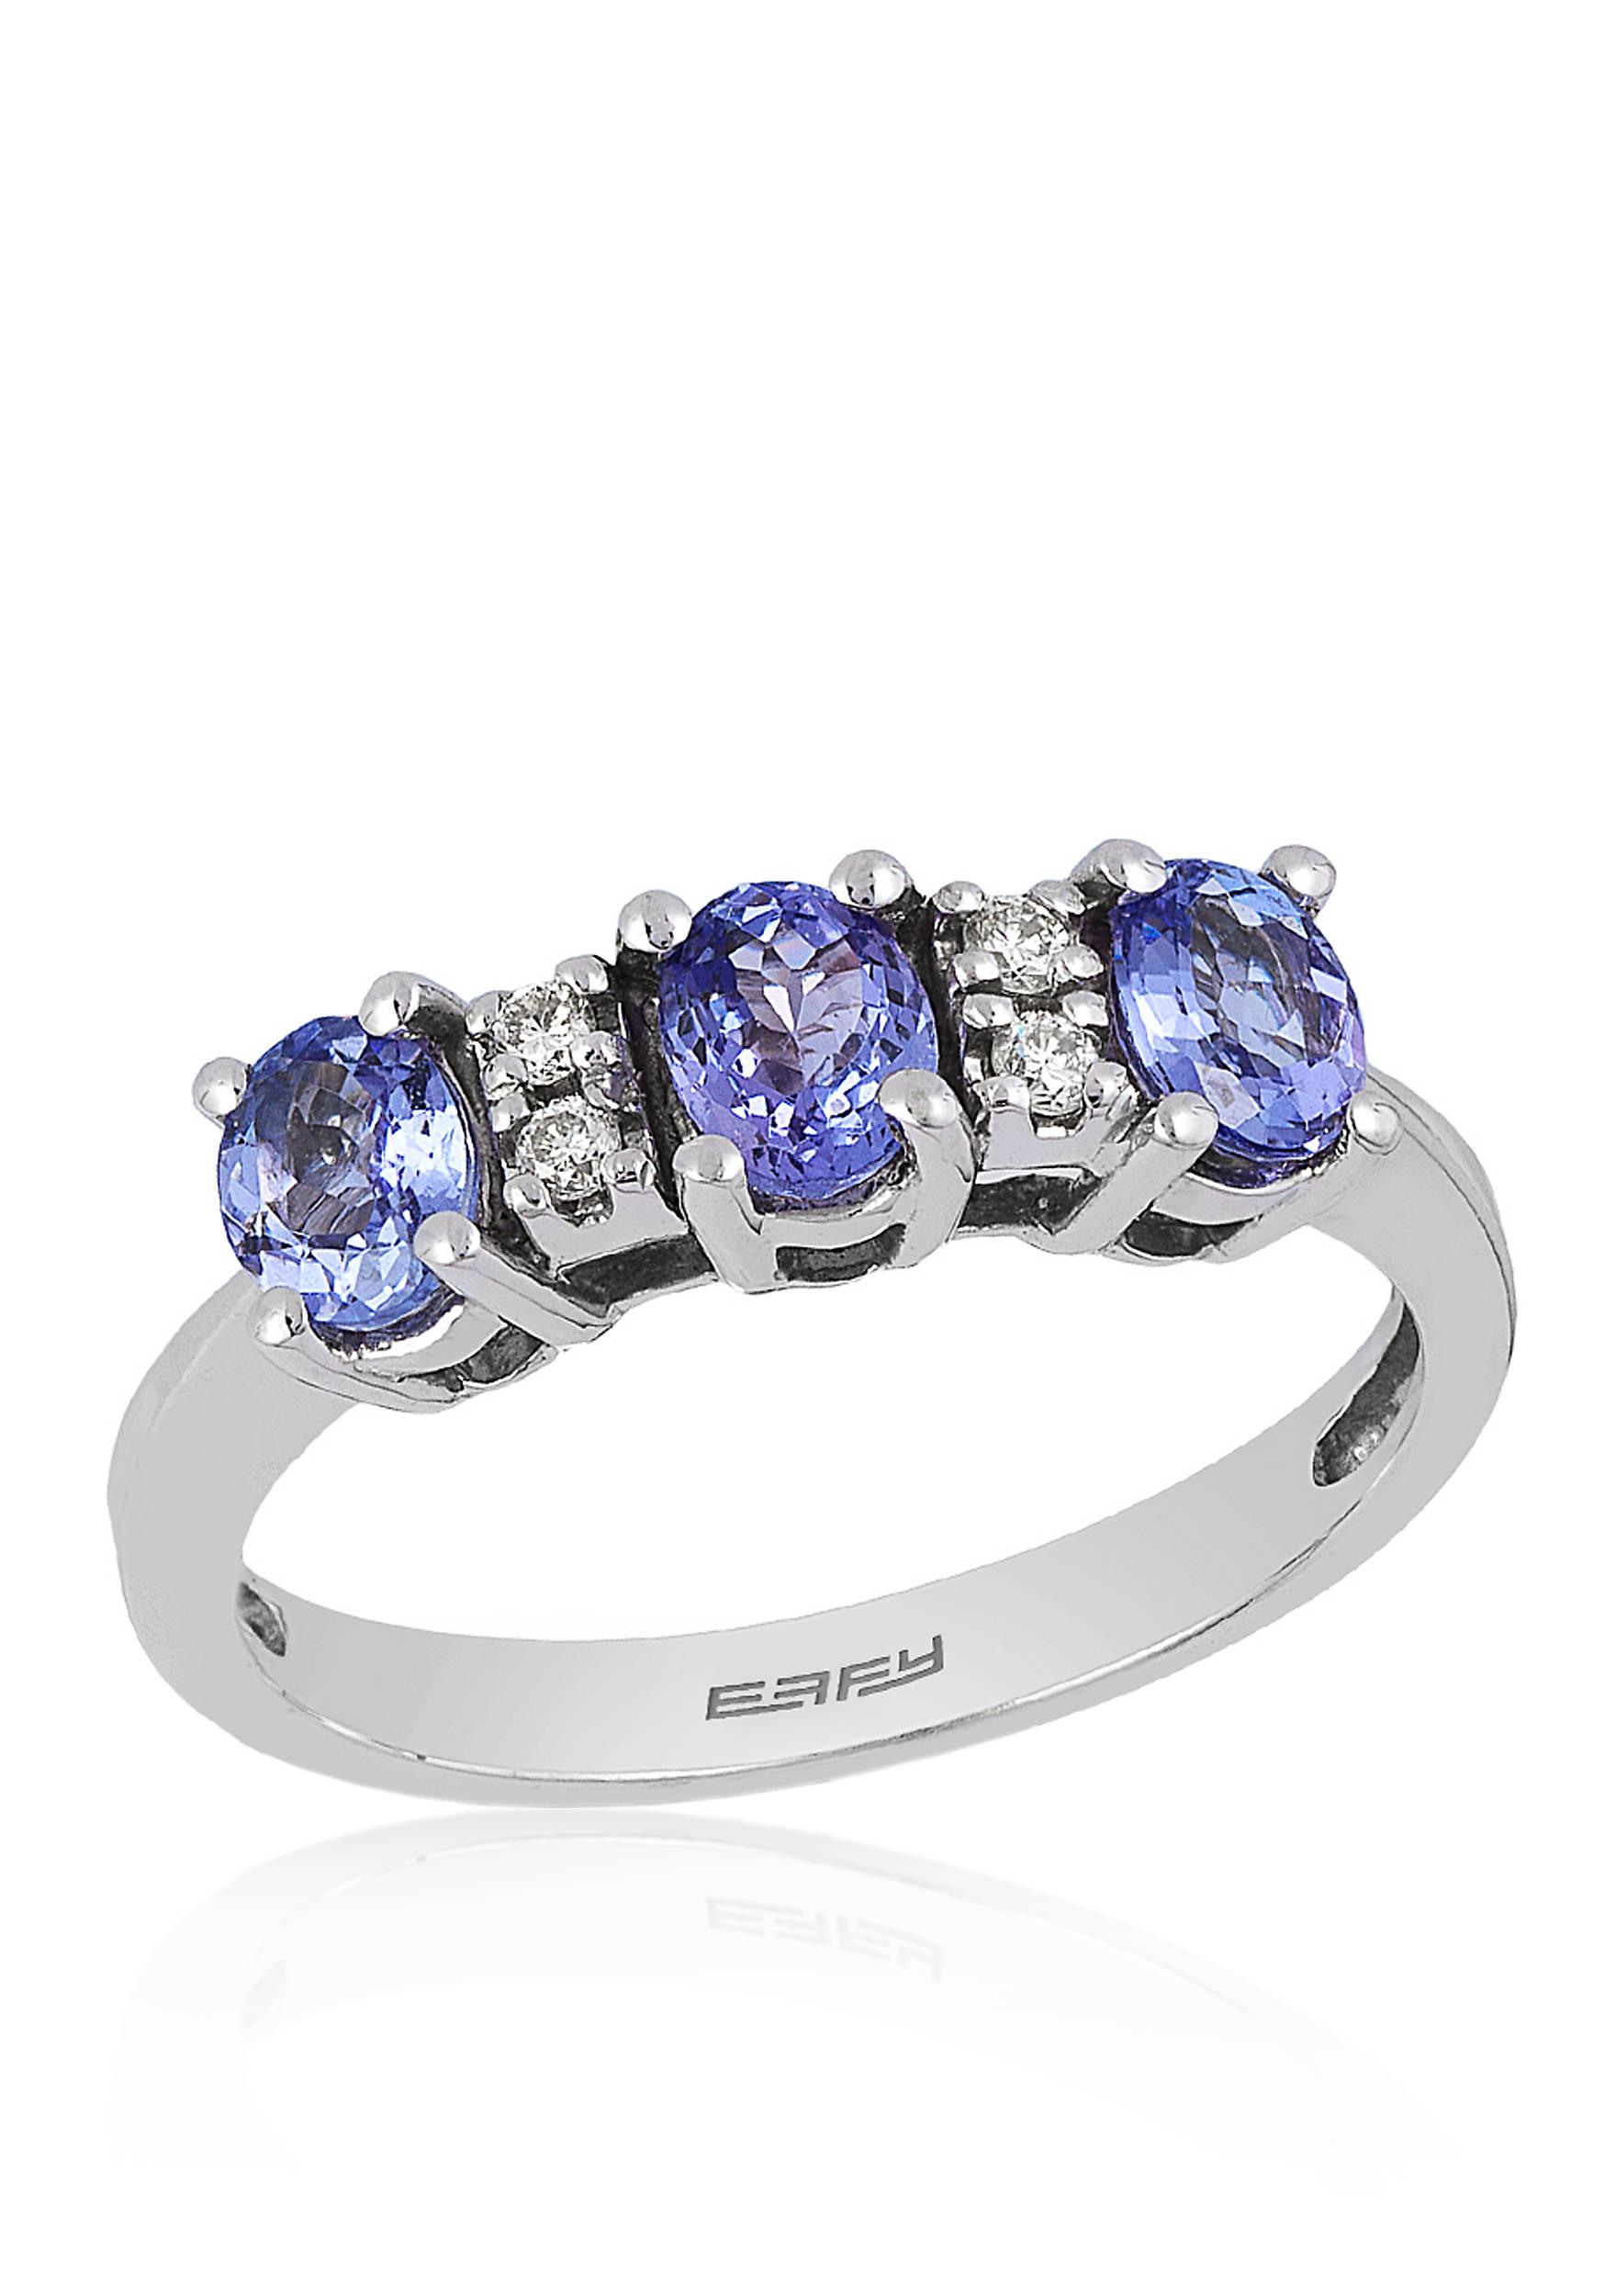 Effy® Tanzanite and Diamond Ring in 14K White Gold | belk